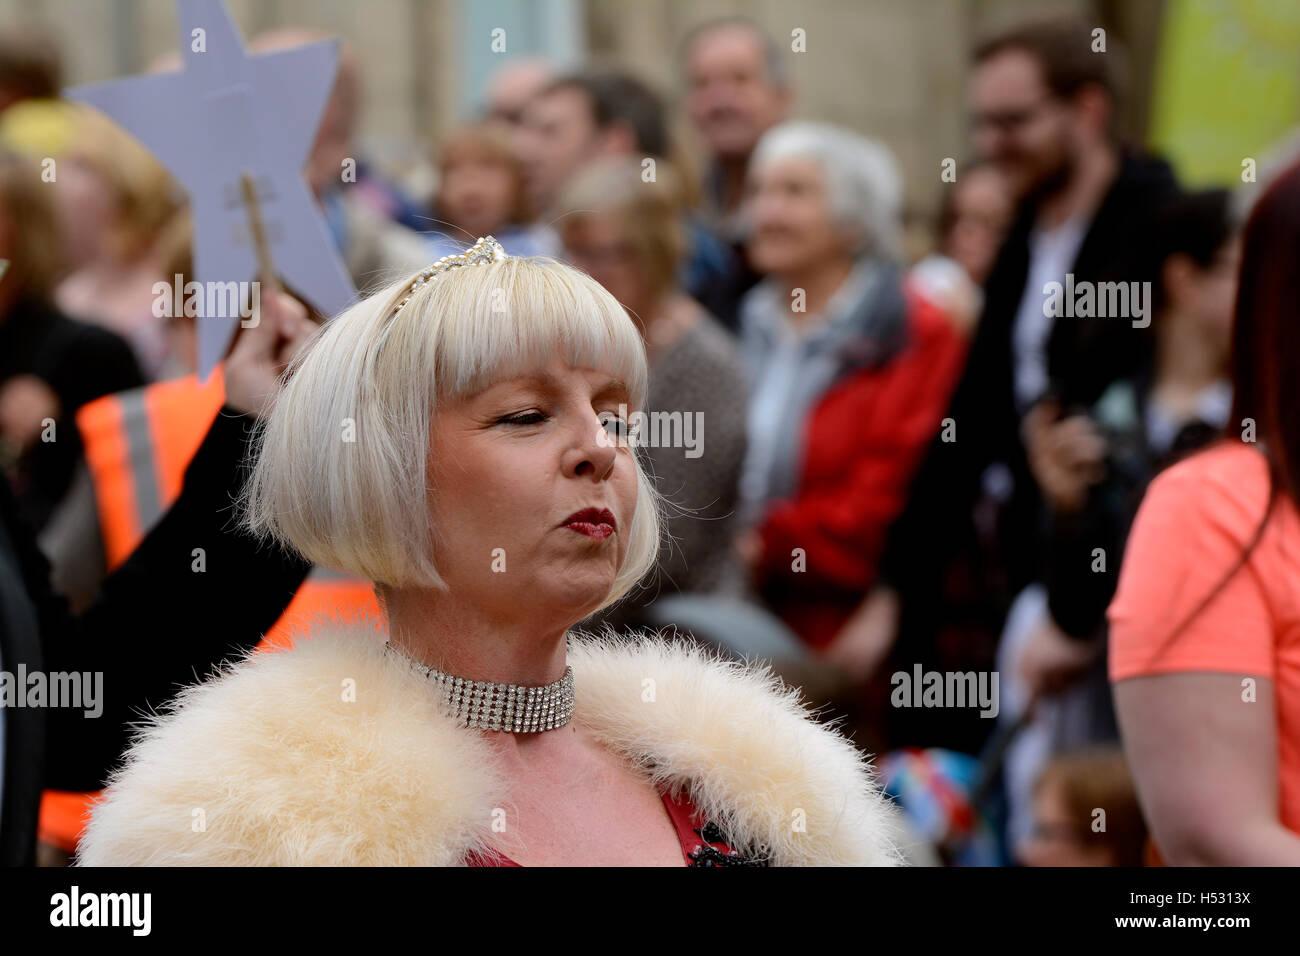 A posh lady wearing diamonds and fur - Stock Image